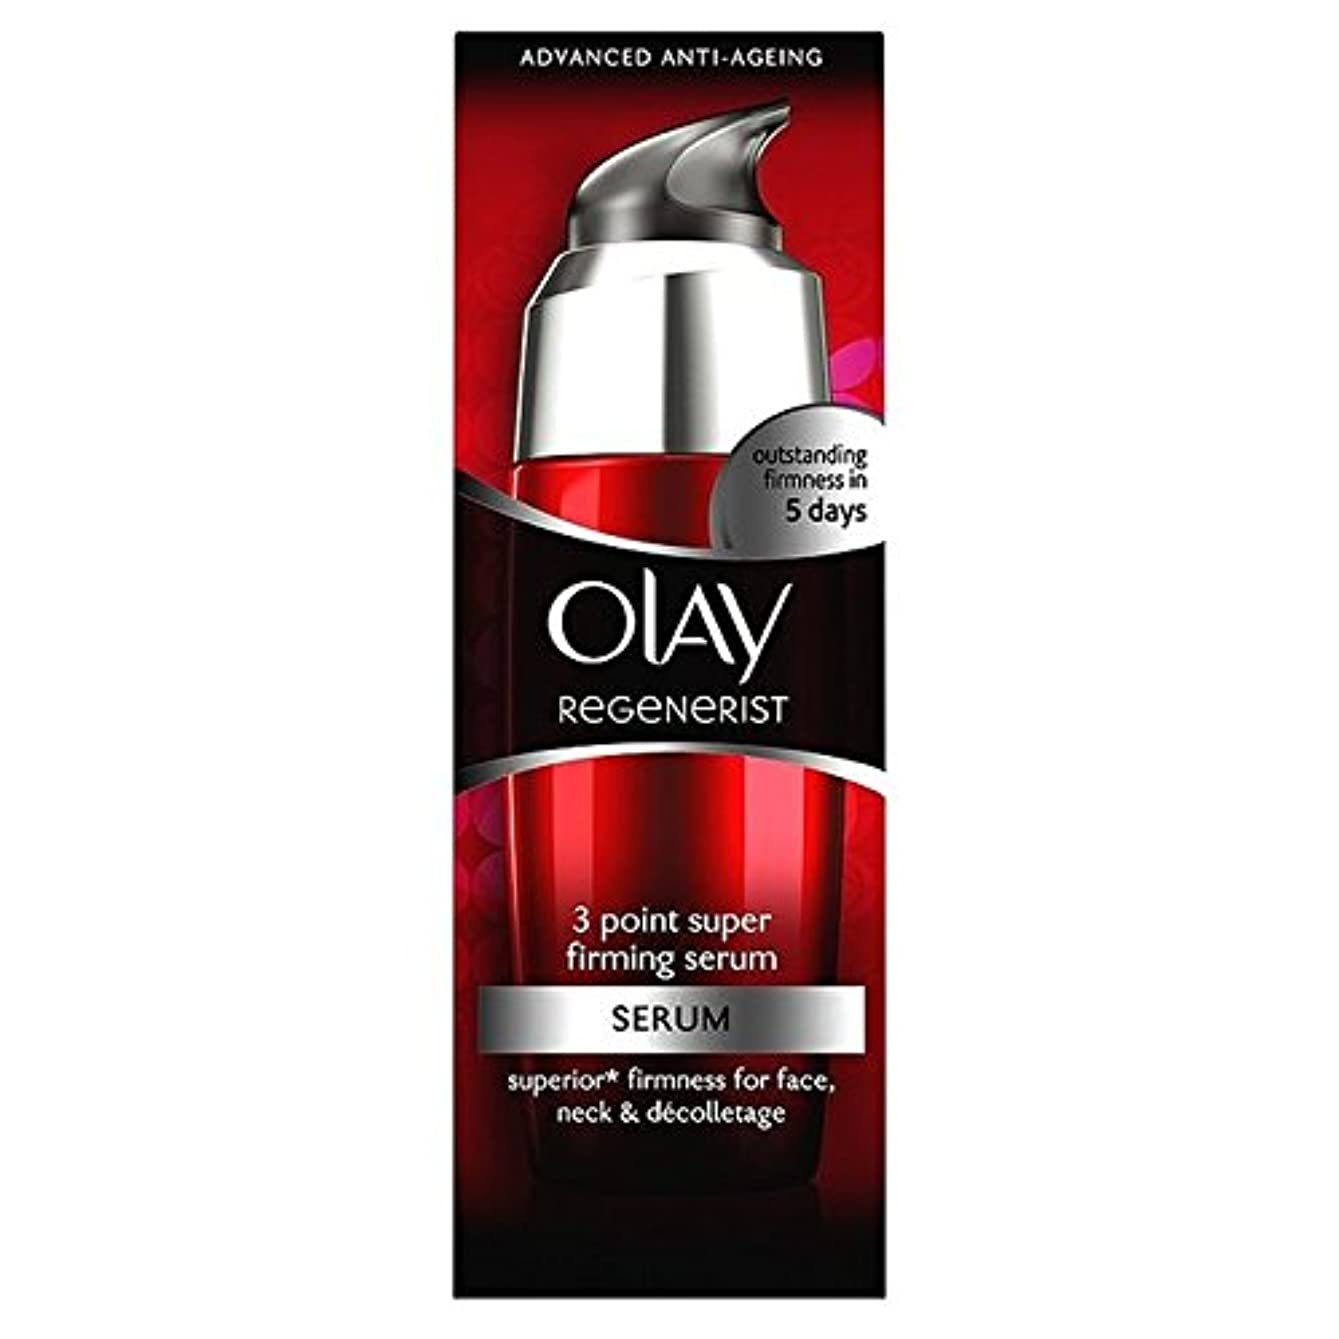 Olay Regenerist Moisturiser 3 Point Treatment Super Serum 50ml - オーレイリジェネ保湿3ポイント治療スーパー血清50ミリリットル [並行輸入品]